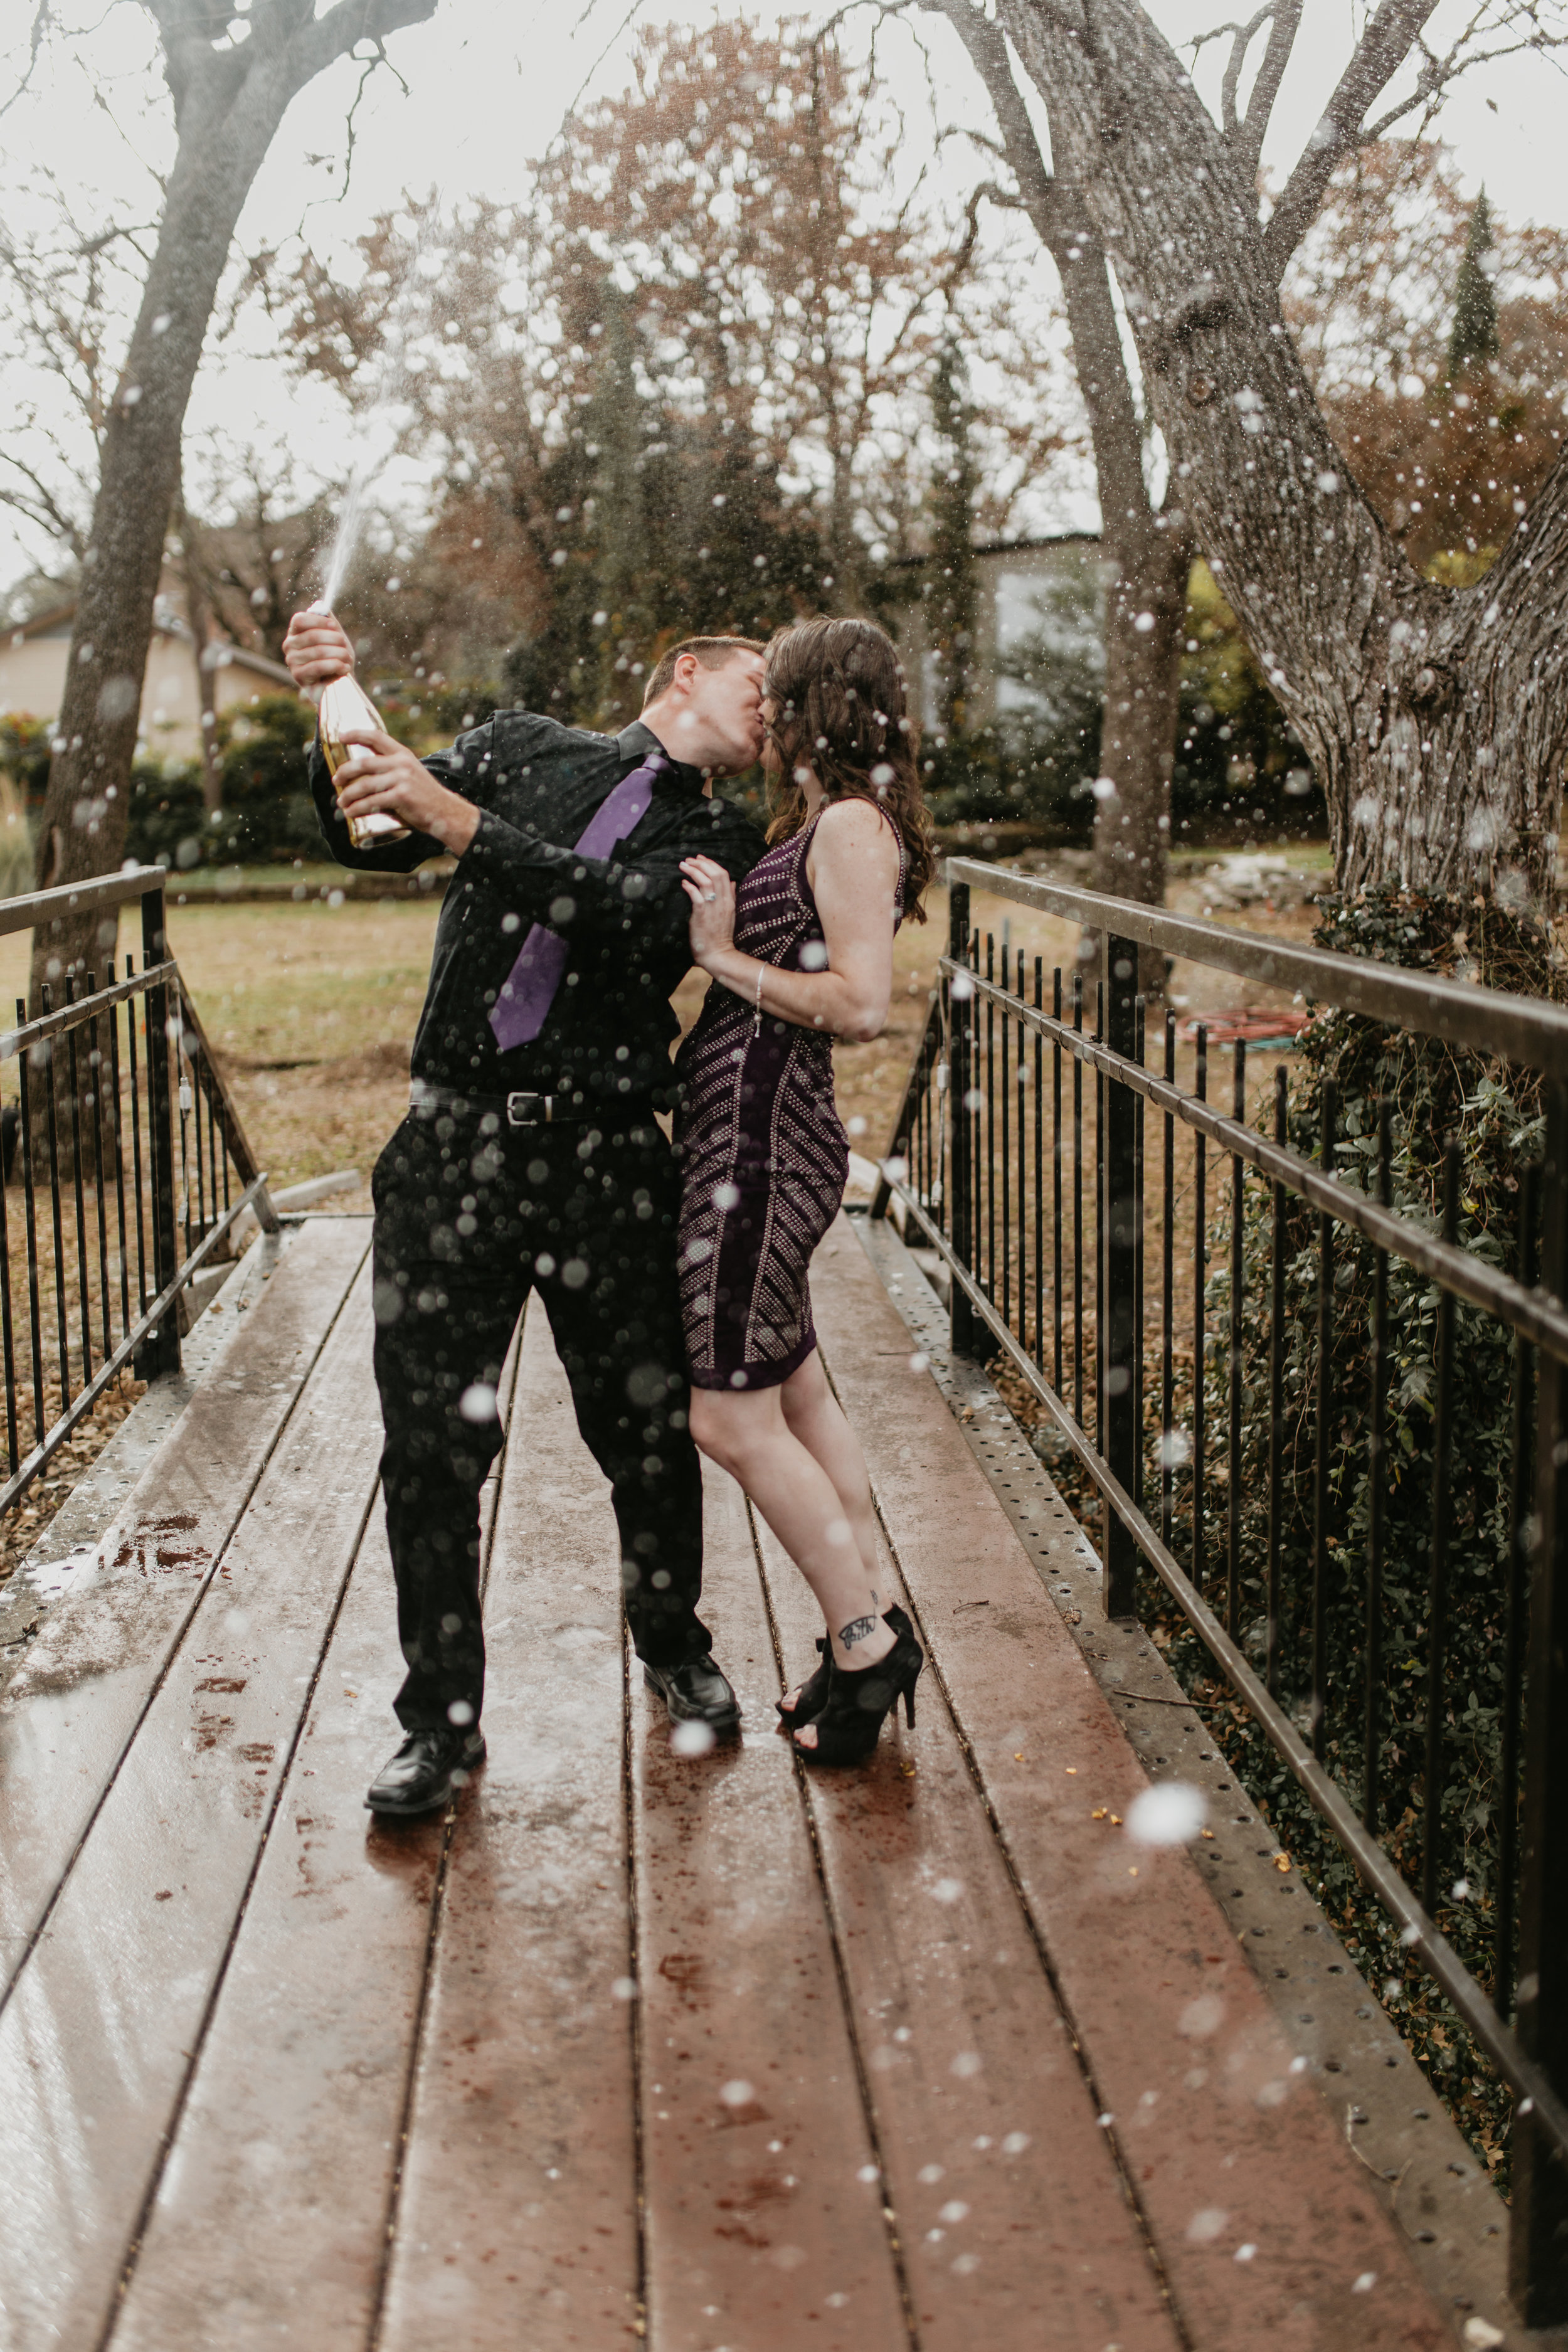 Josephine and James - Engagement Session Sneak Peeks- Meme Urbane Photography-45.jpg